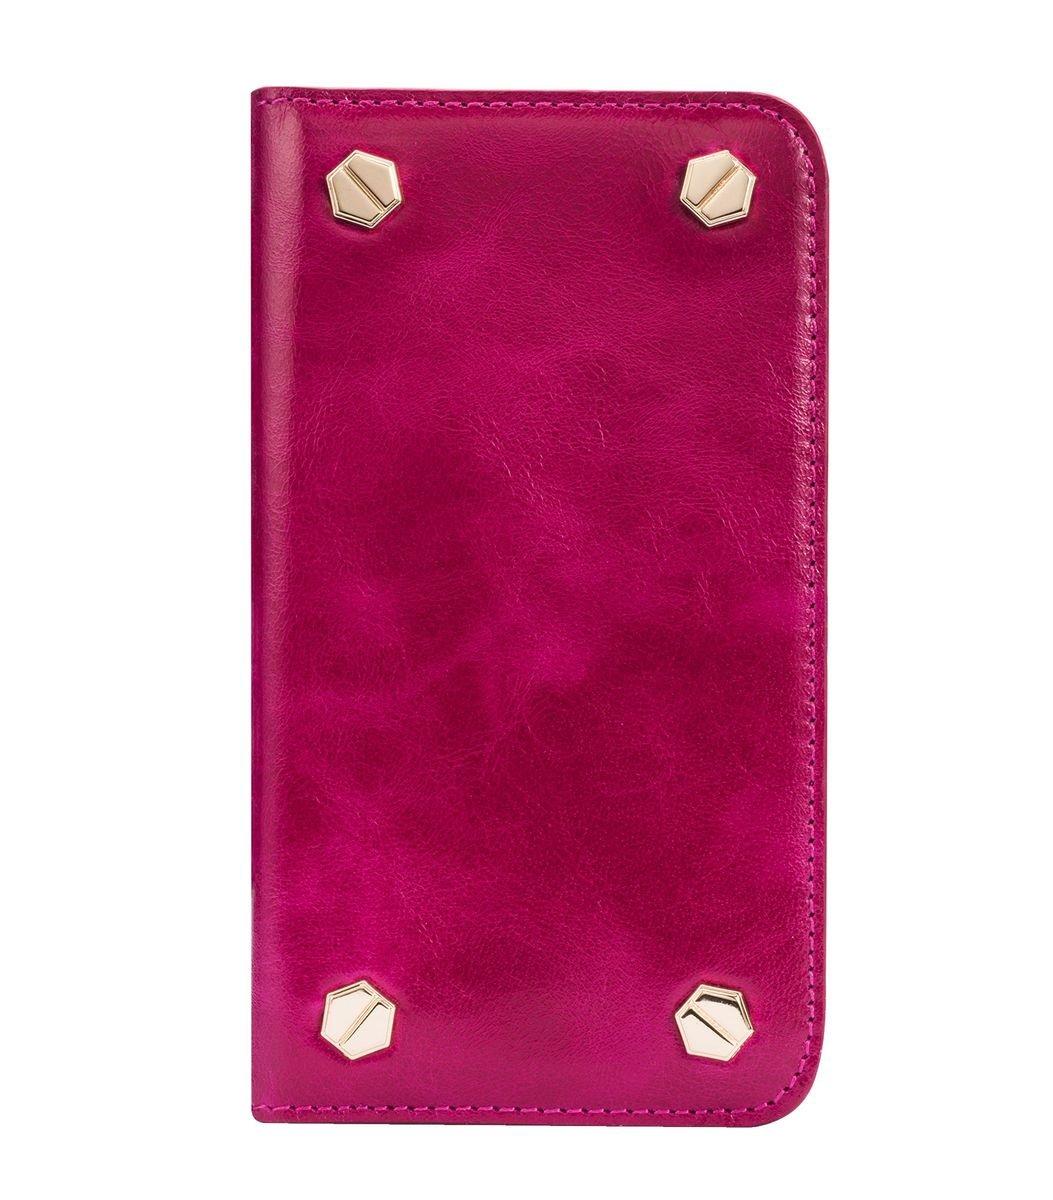 "Apple Iphone 6/6s (4.7"") Hex-shine 系列高級牛皮時尚手機套 (奧利佛紫色)"